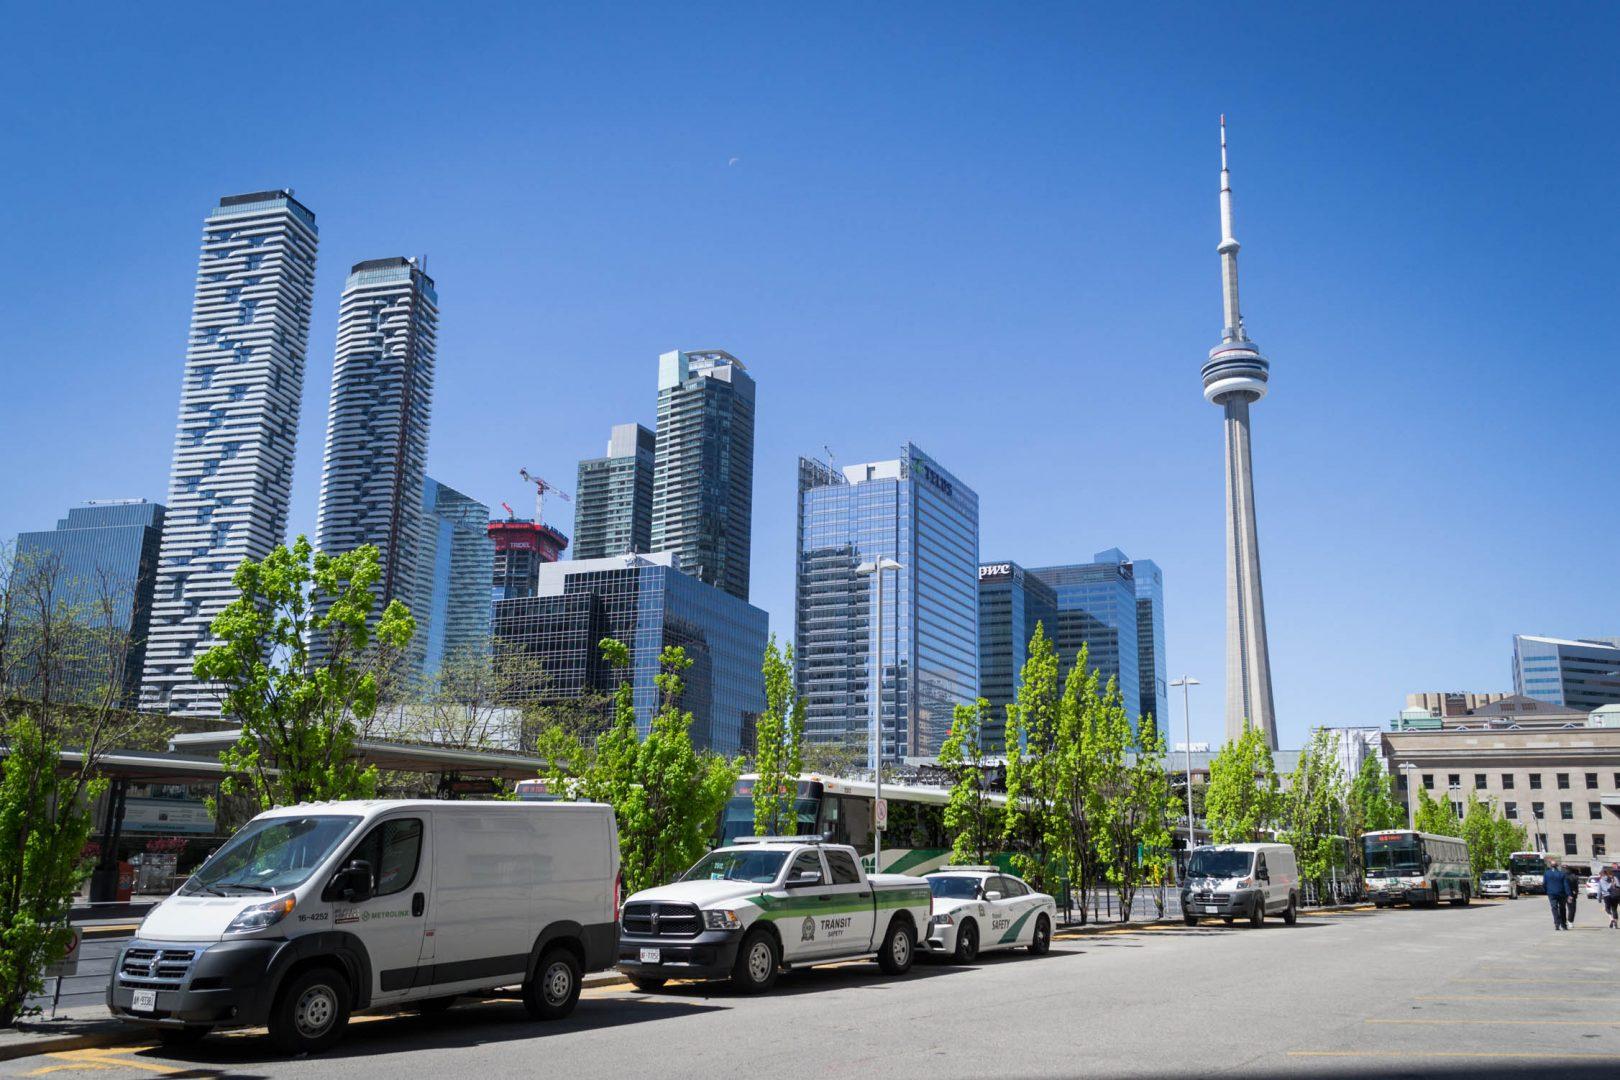 [ROAD TRIP USA 2017] Toronto